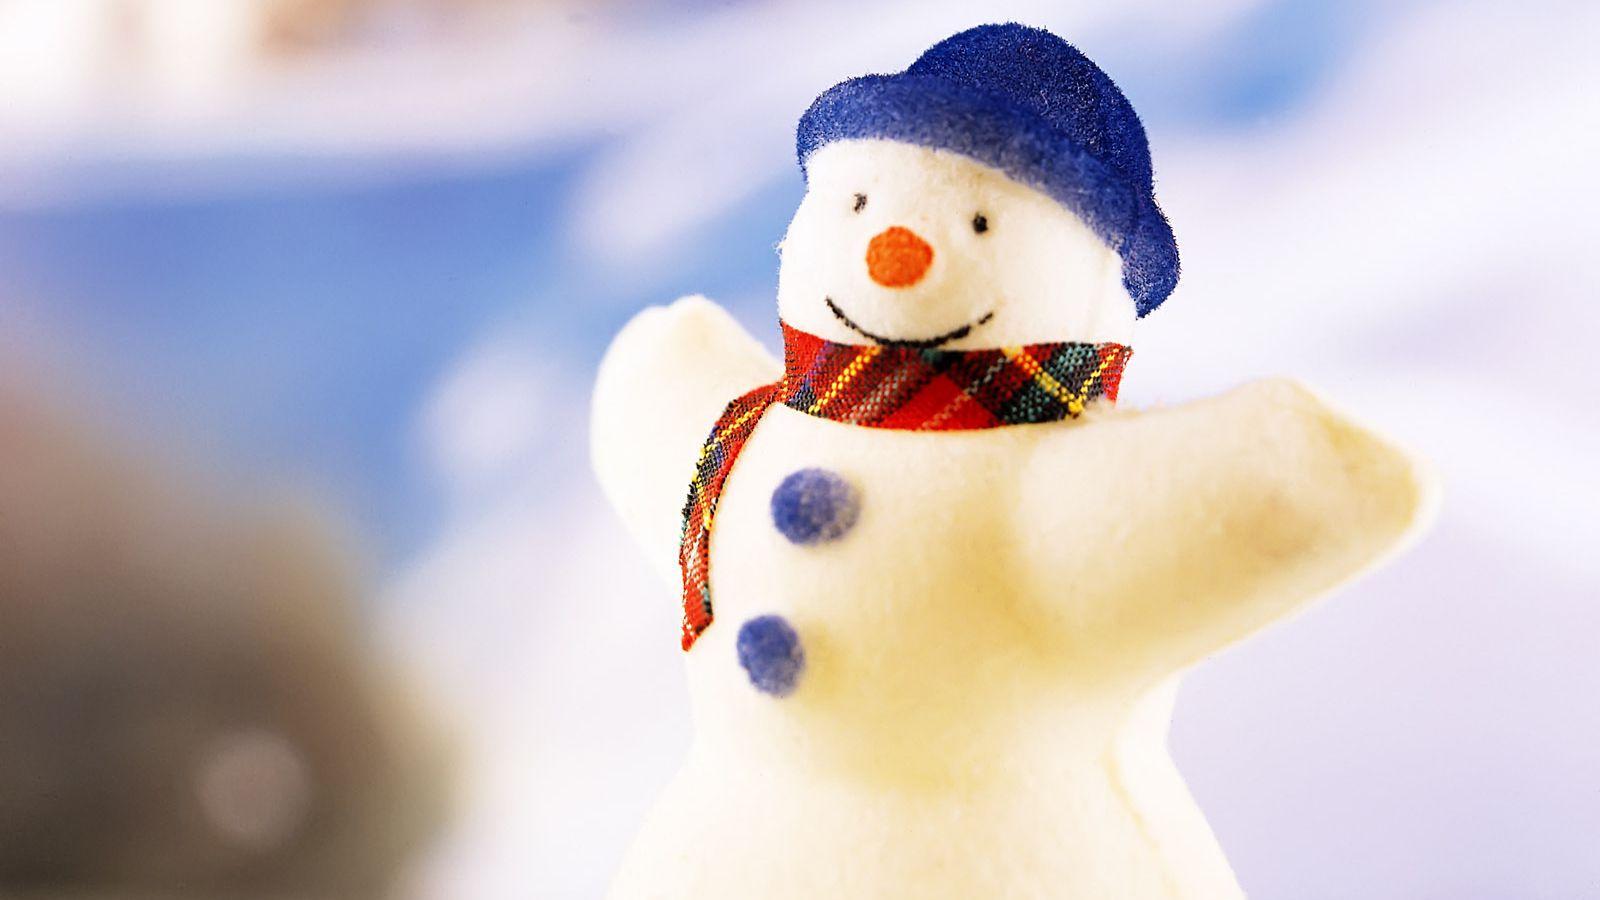 snowman christmas wallpaper 5a282082842b170019b22ea1